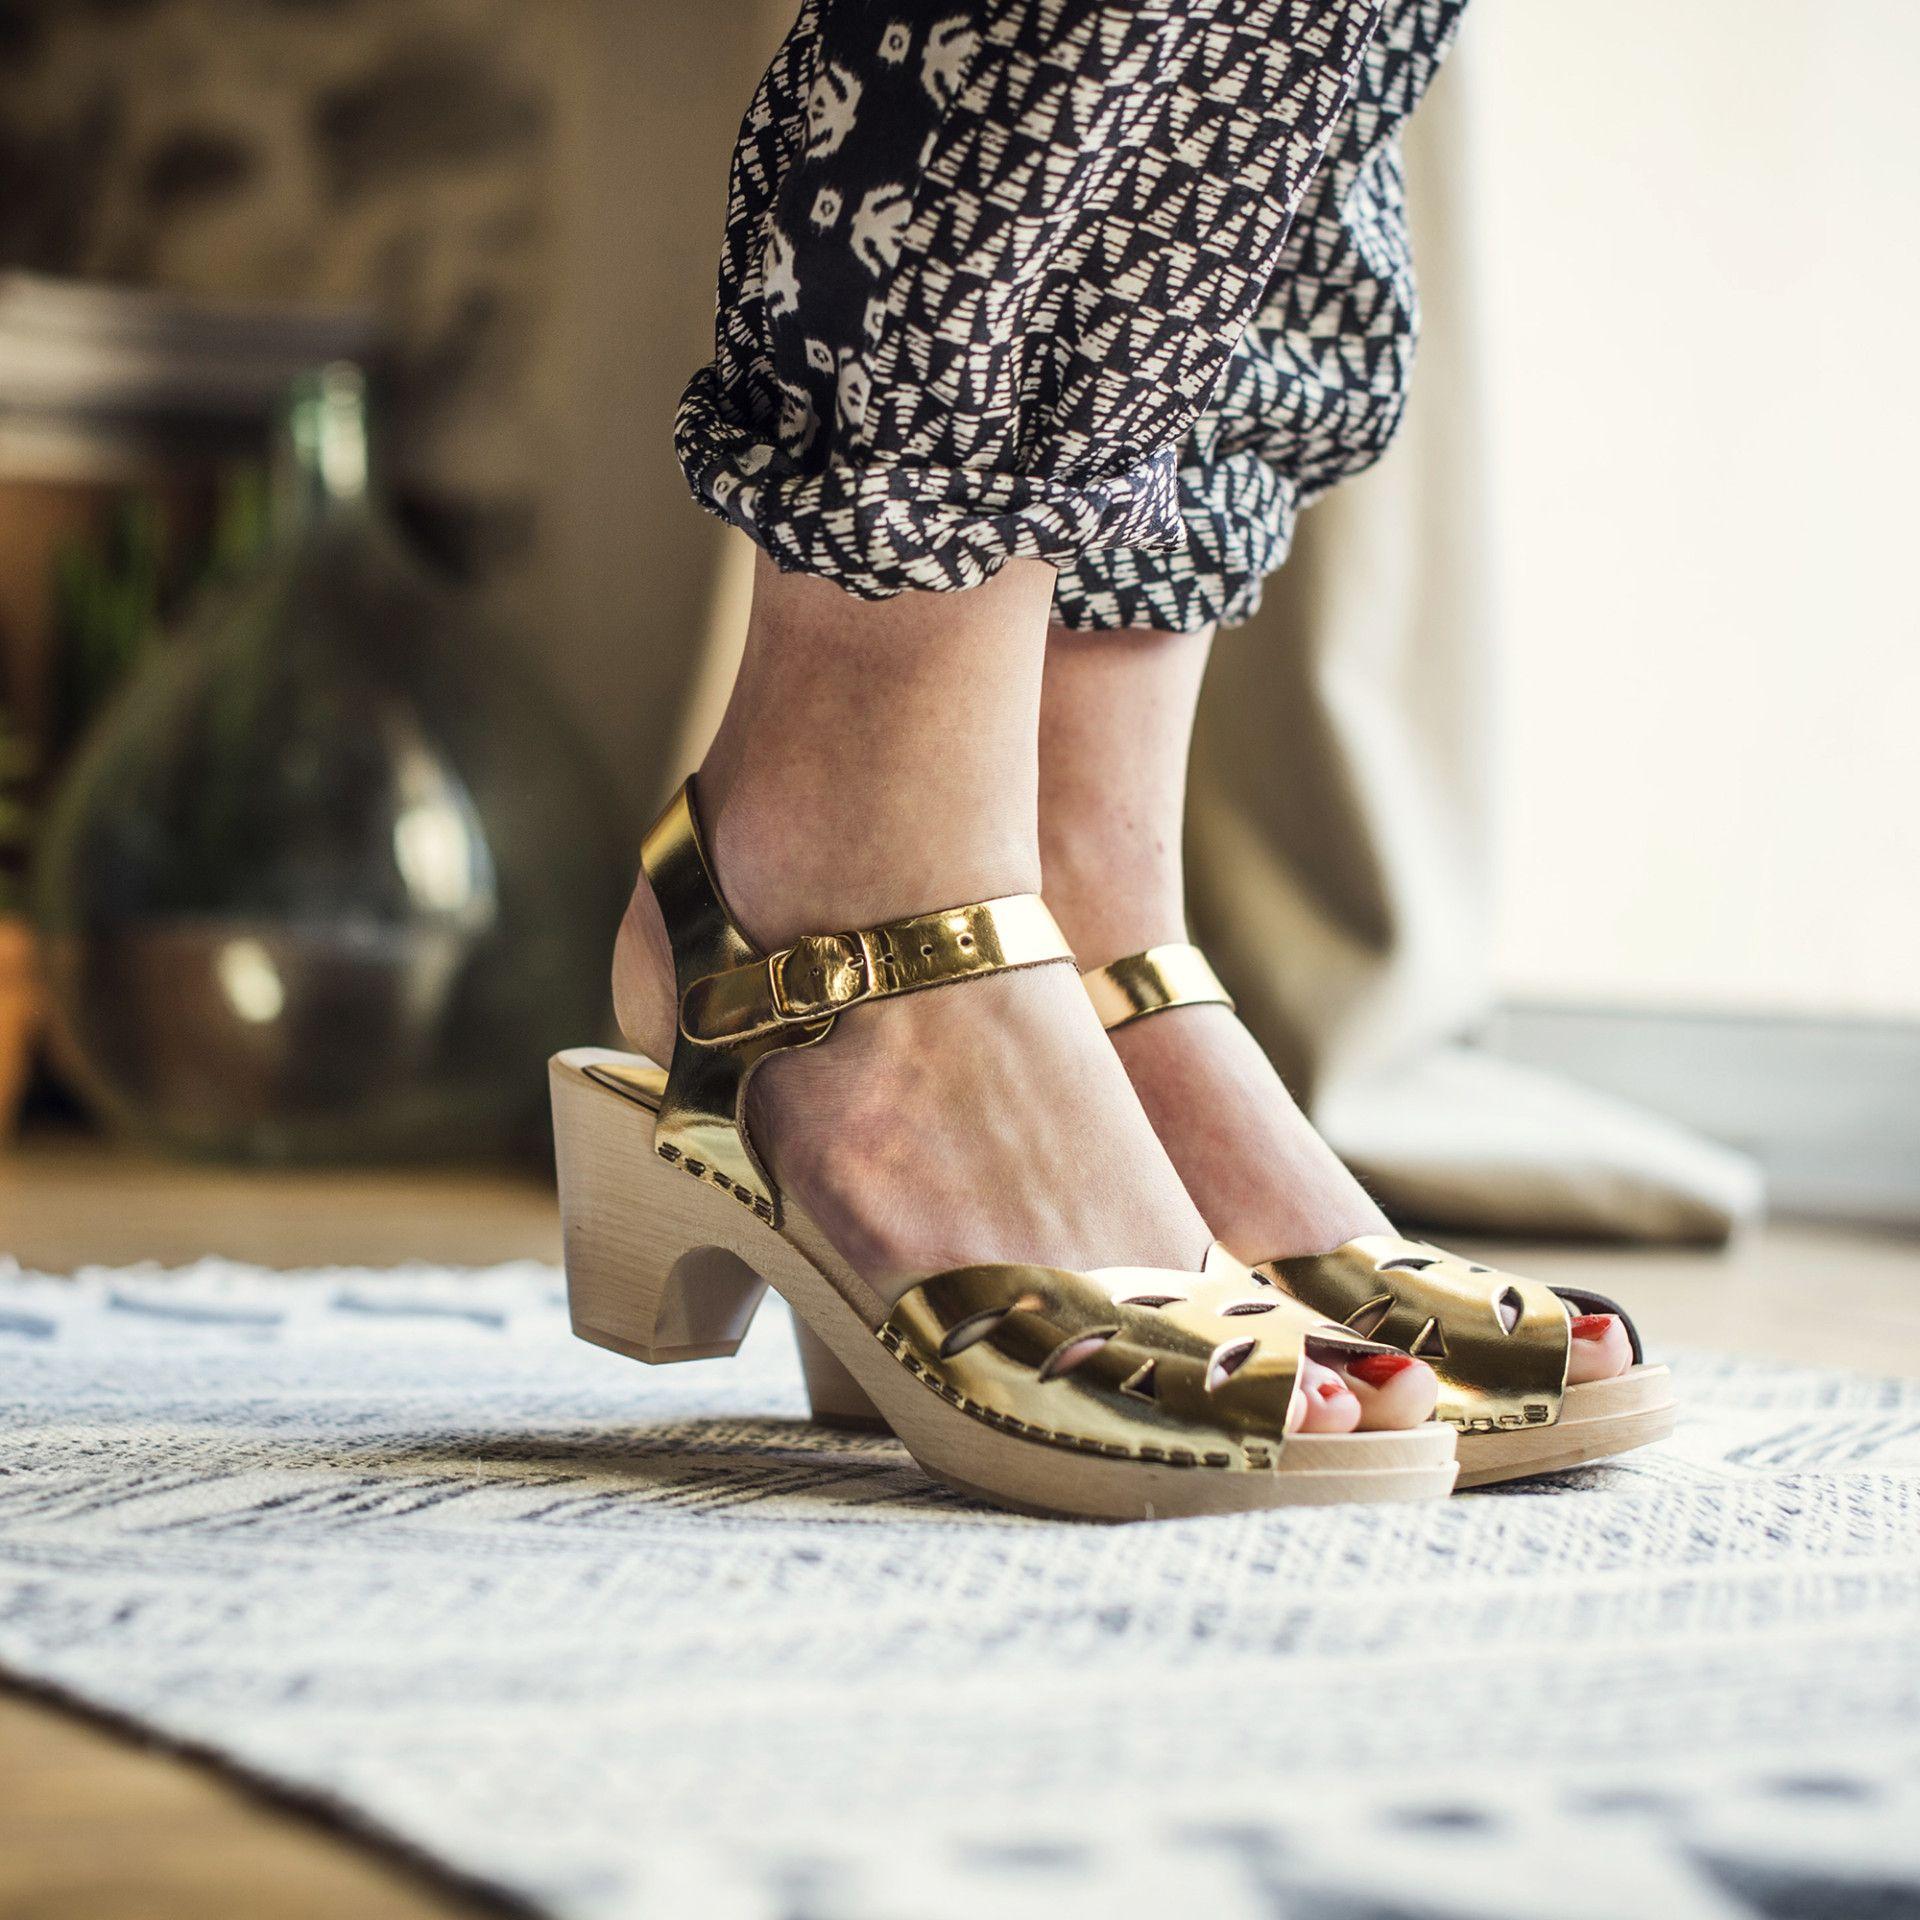 34b247666ffe39 SANDALE RIKA - sandales - CHAUSSURES - FEMME   Bocage   wish list ...